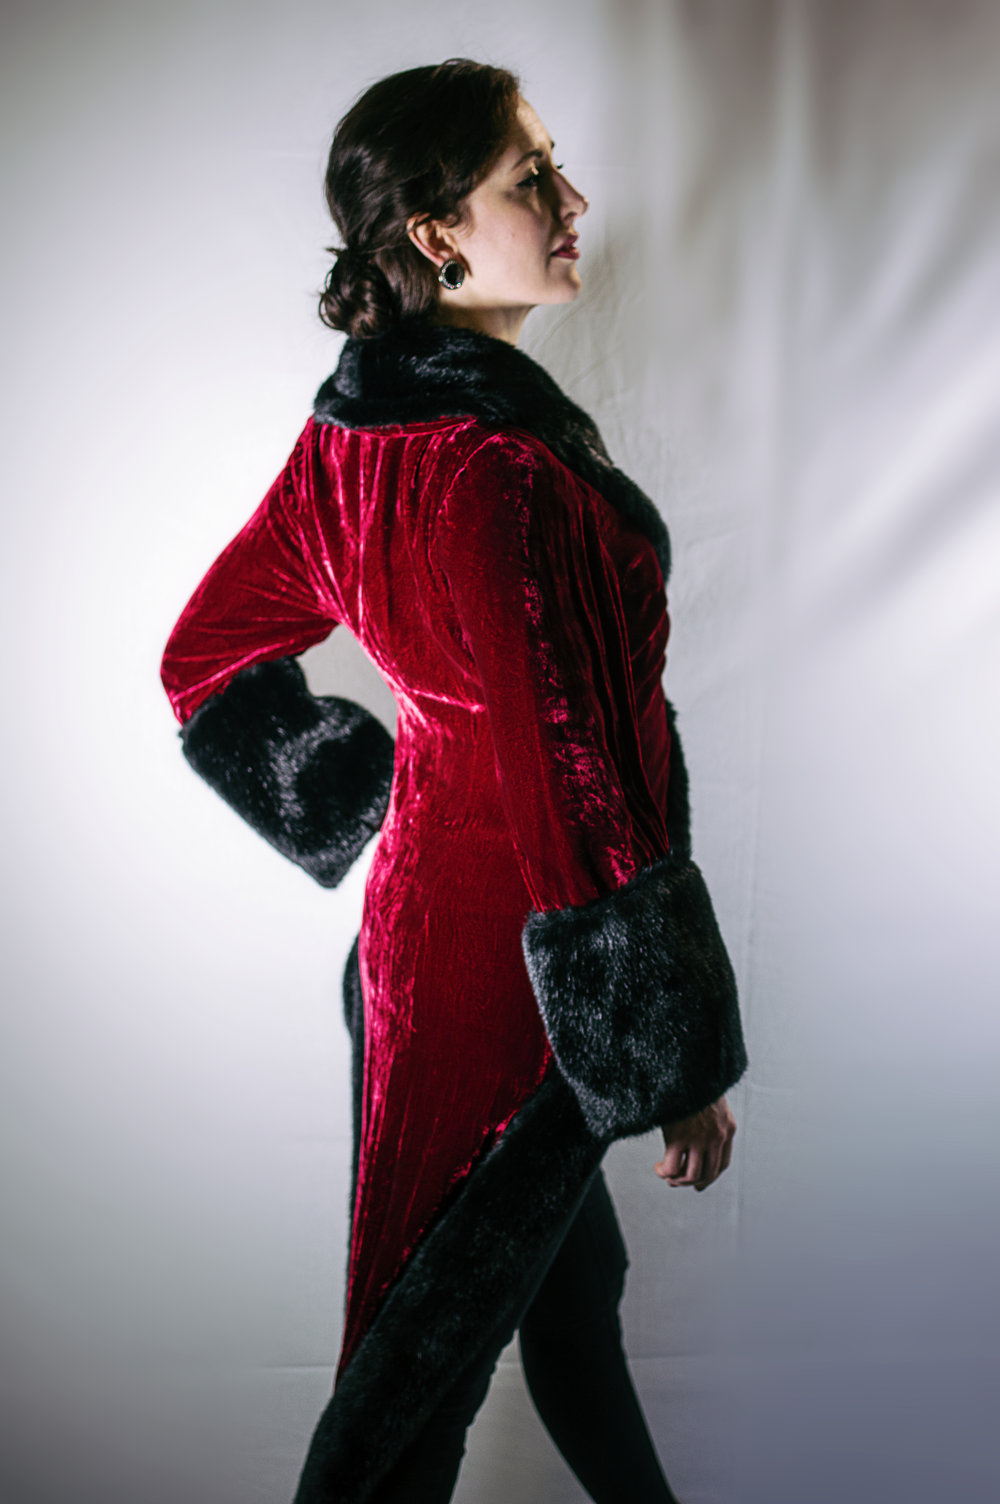 vivien conacher (mezzo-soprano) wears item 101: red velvet and fur tailcoat